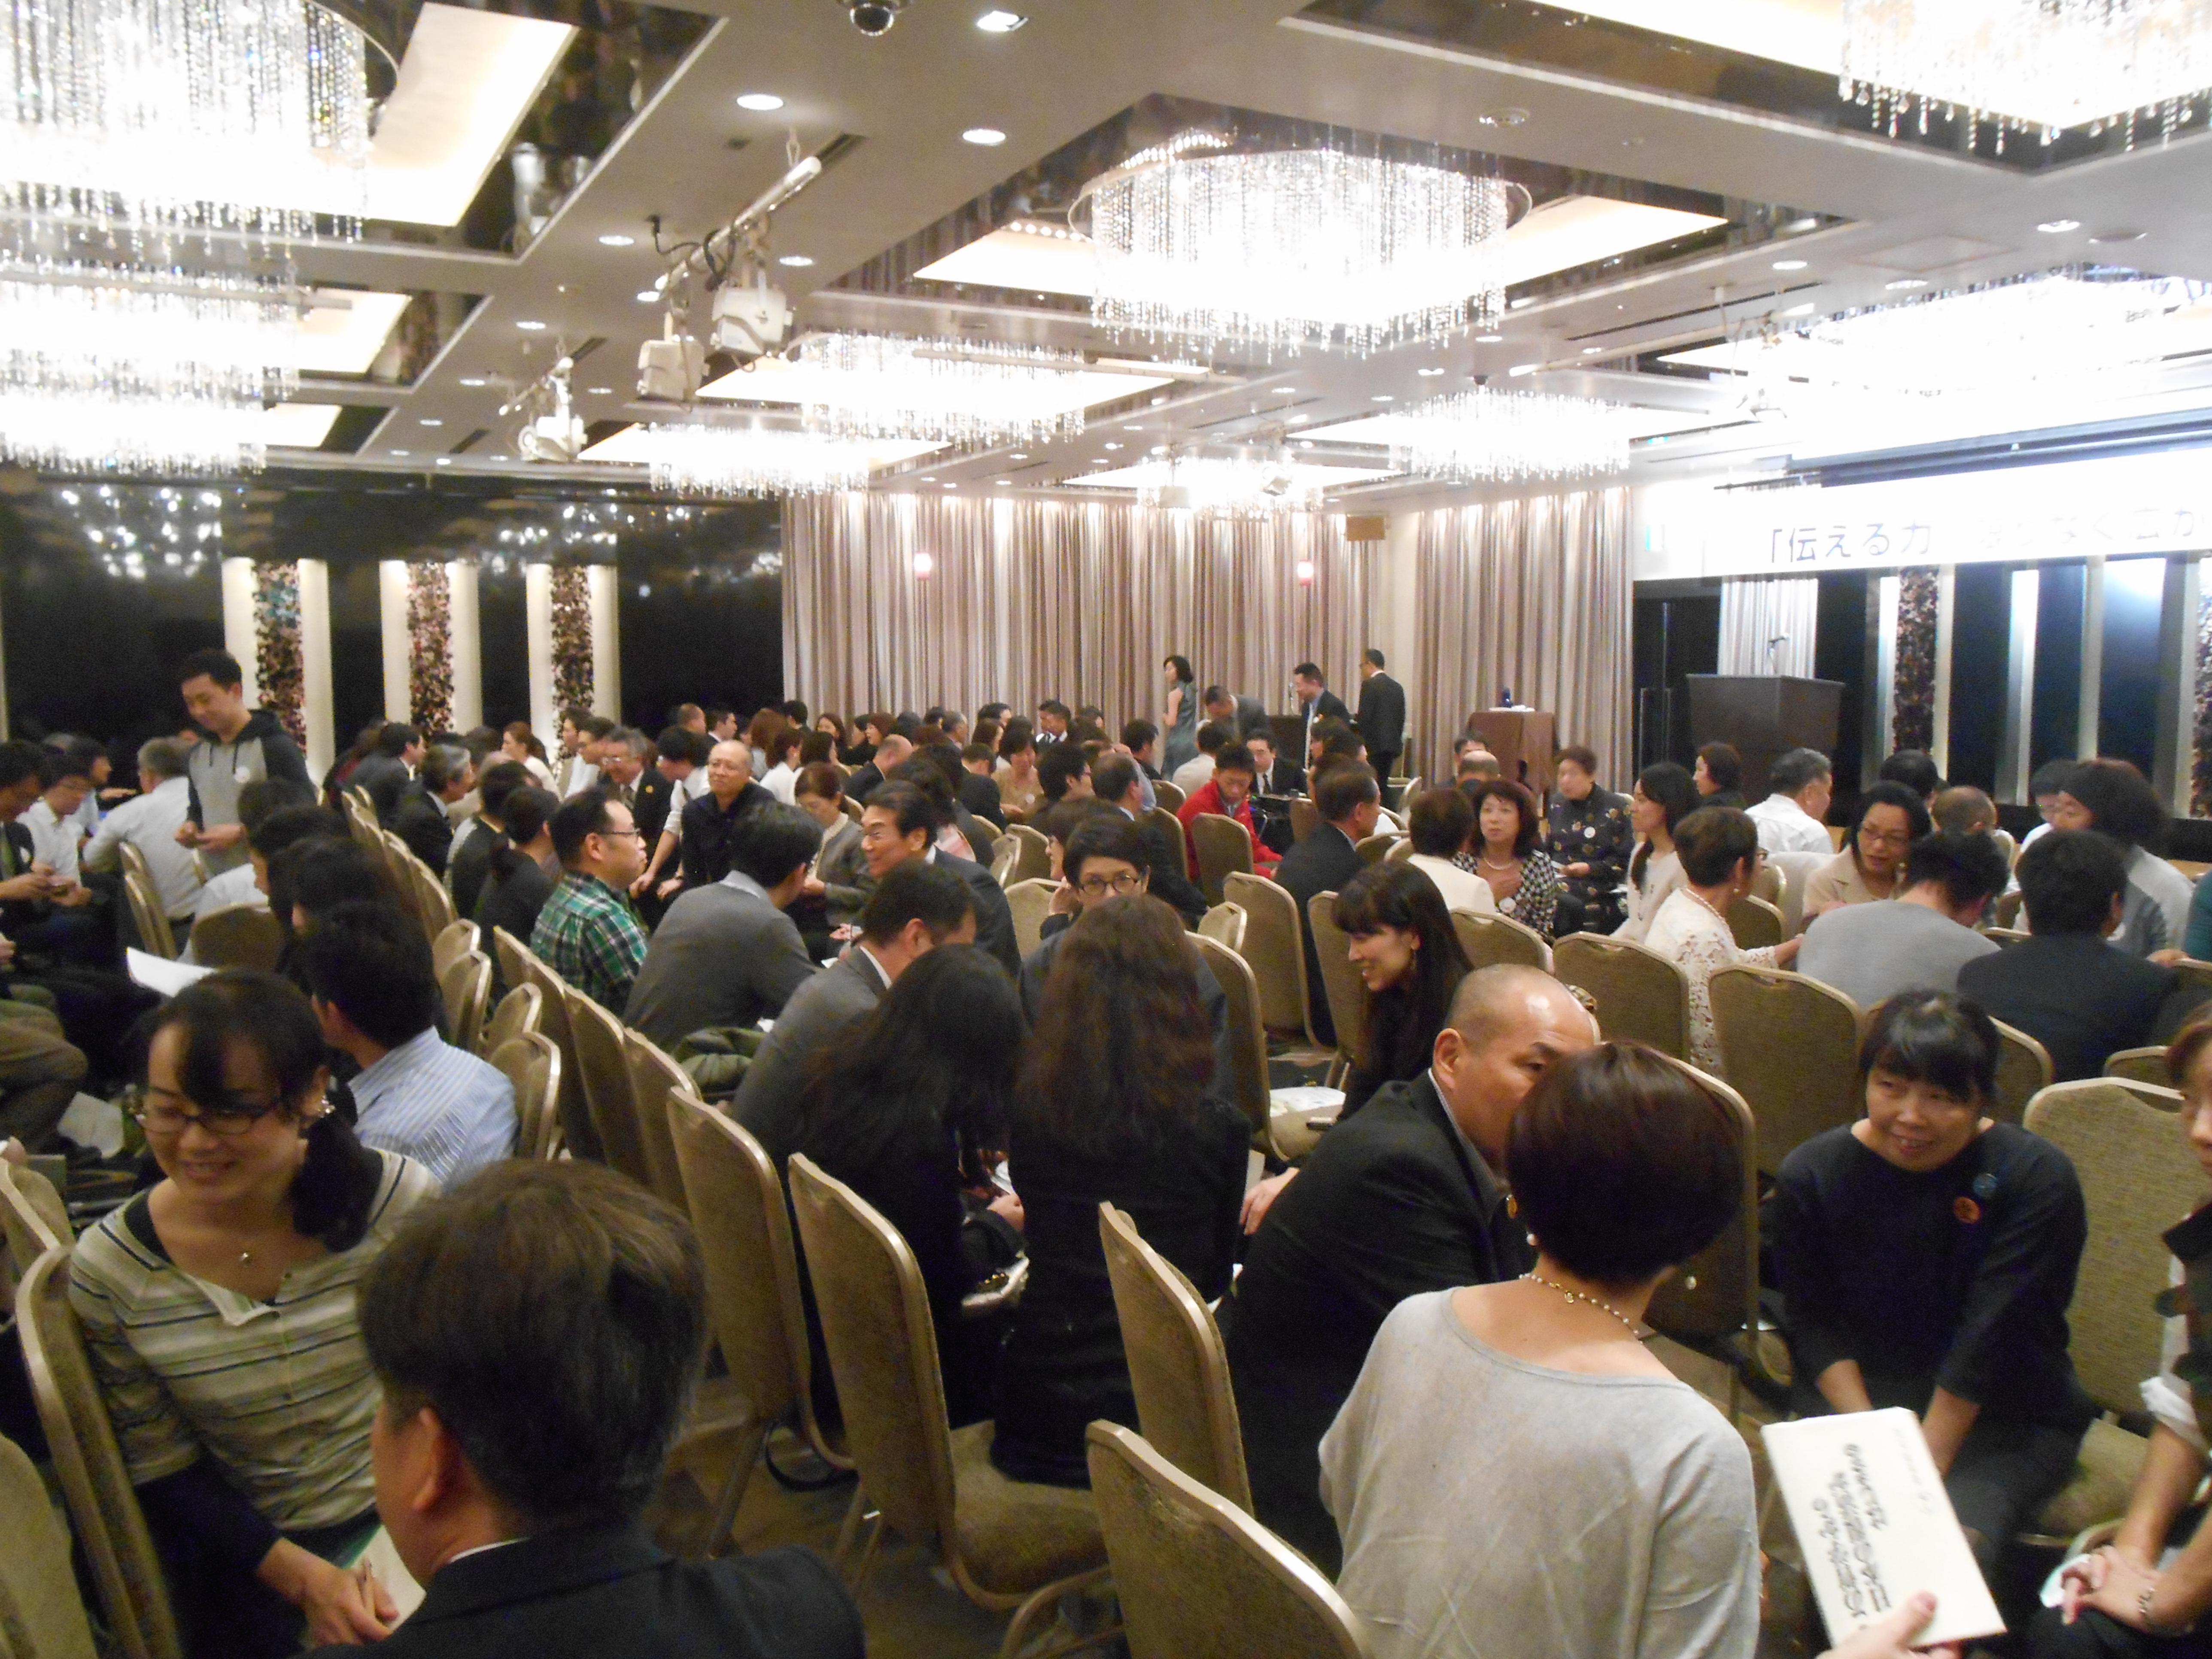 DSCN2090 - 平成30年度 東京思風塾 4月7日(土)「時代が問題をつくり、問題が人物をつくる」